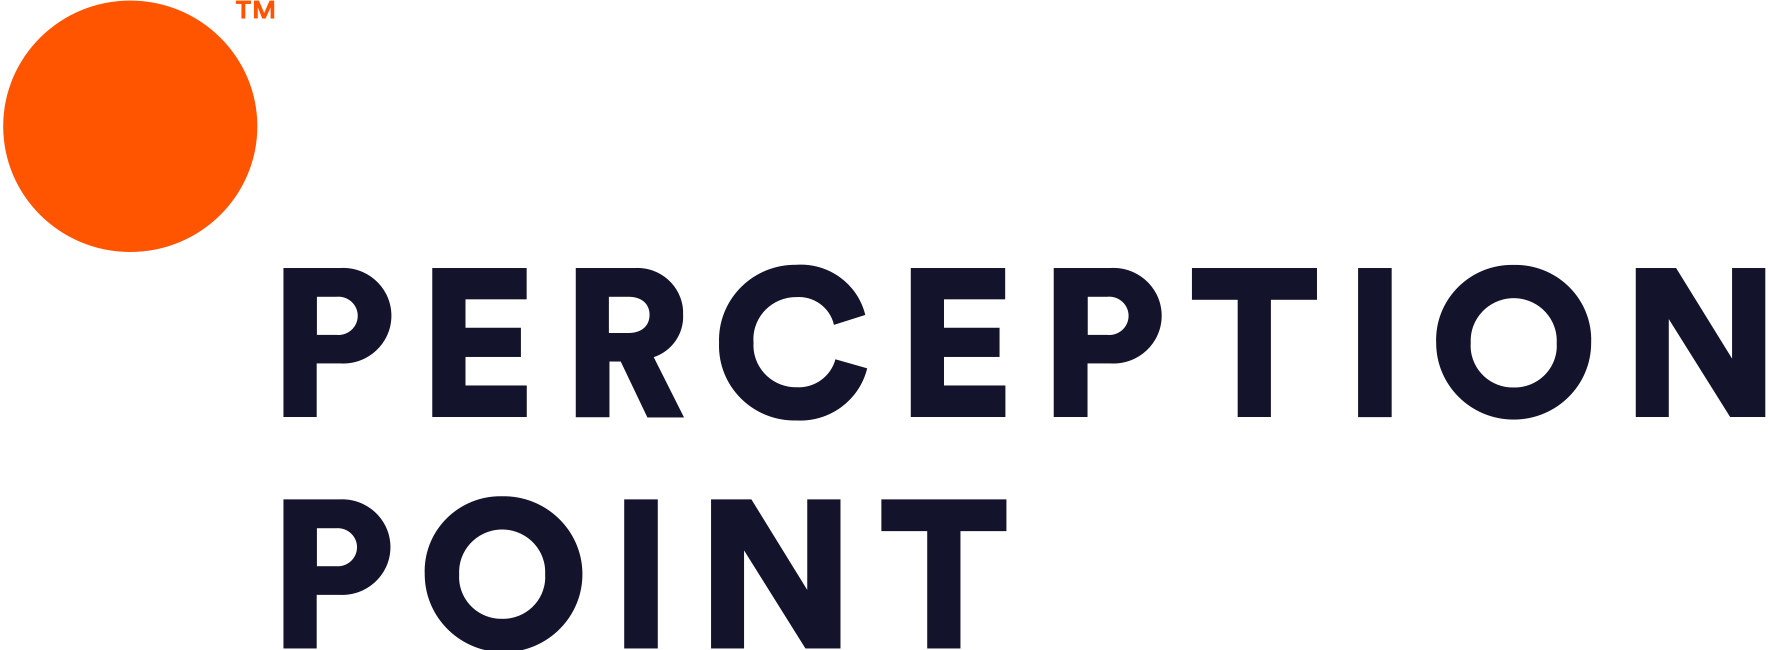 perception point  logo block